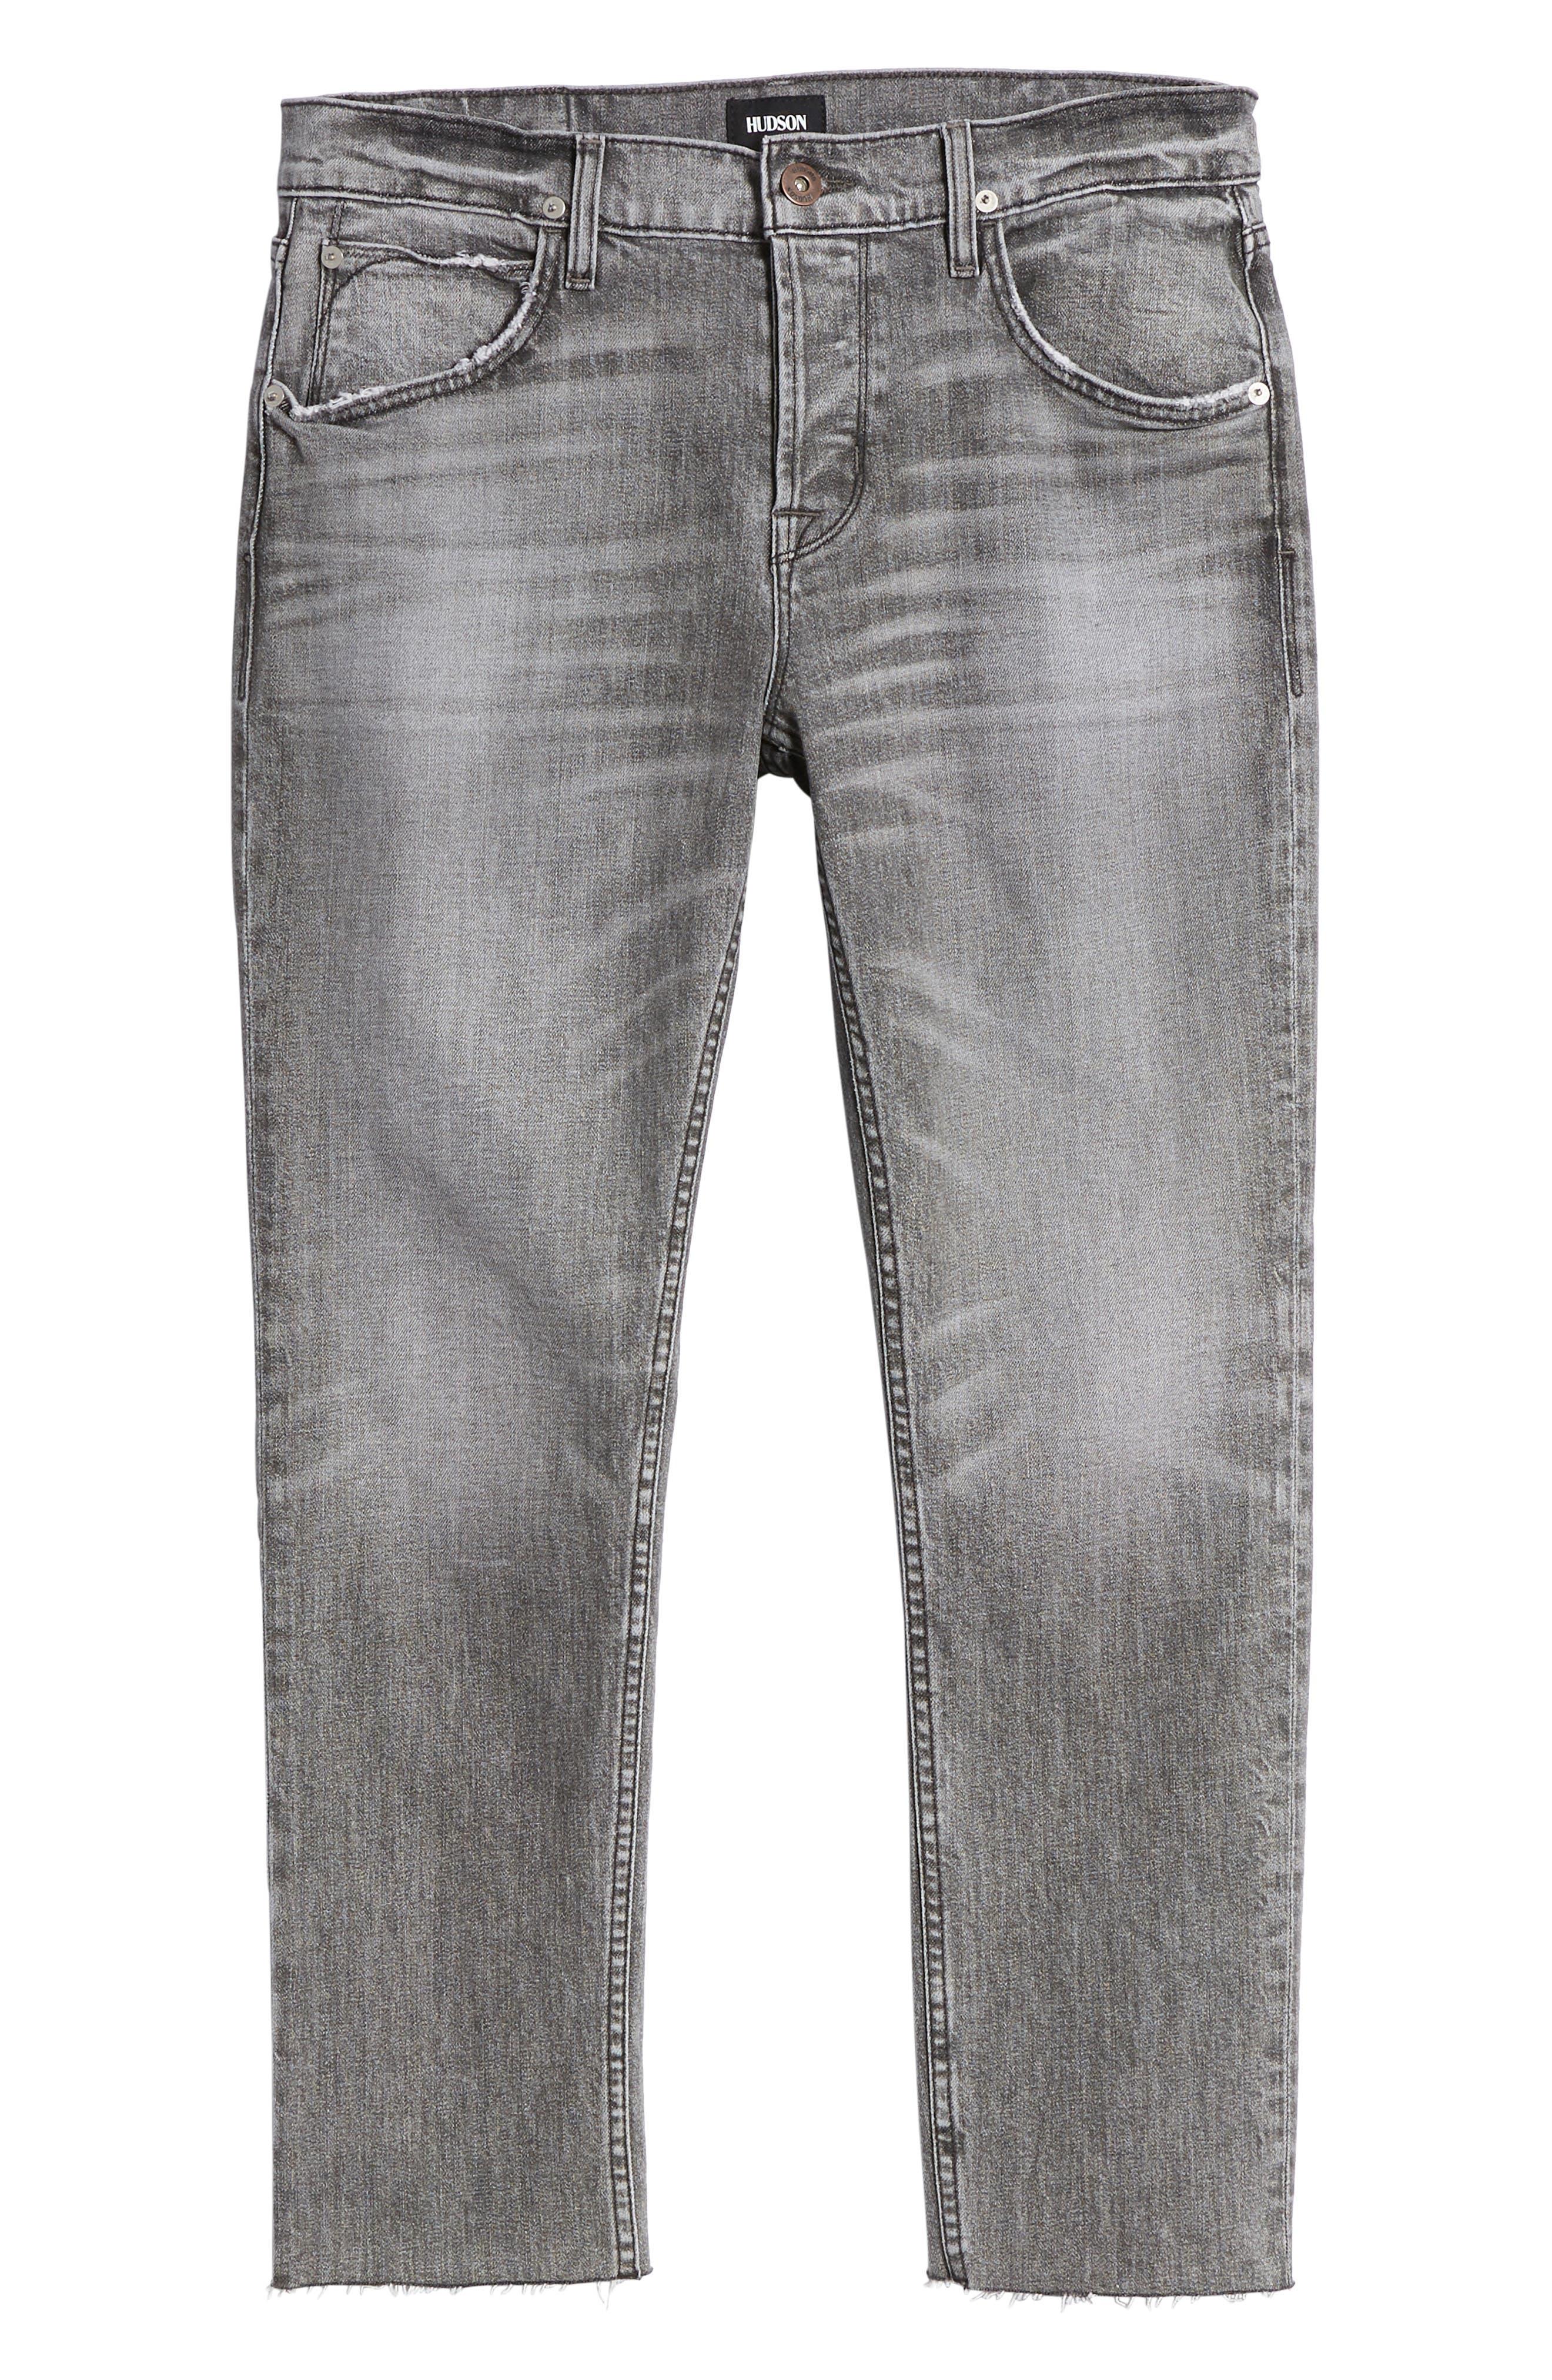 Blake Slim Fit Jeans,                             Alternate thumbnail 6, color,                             Chrome